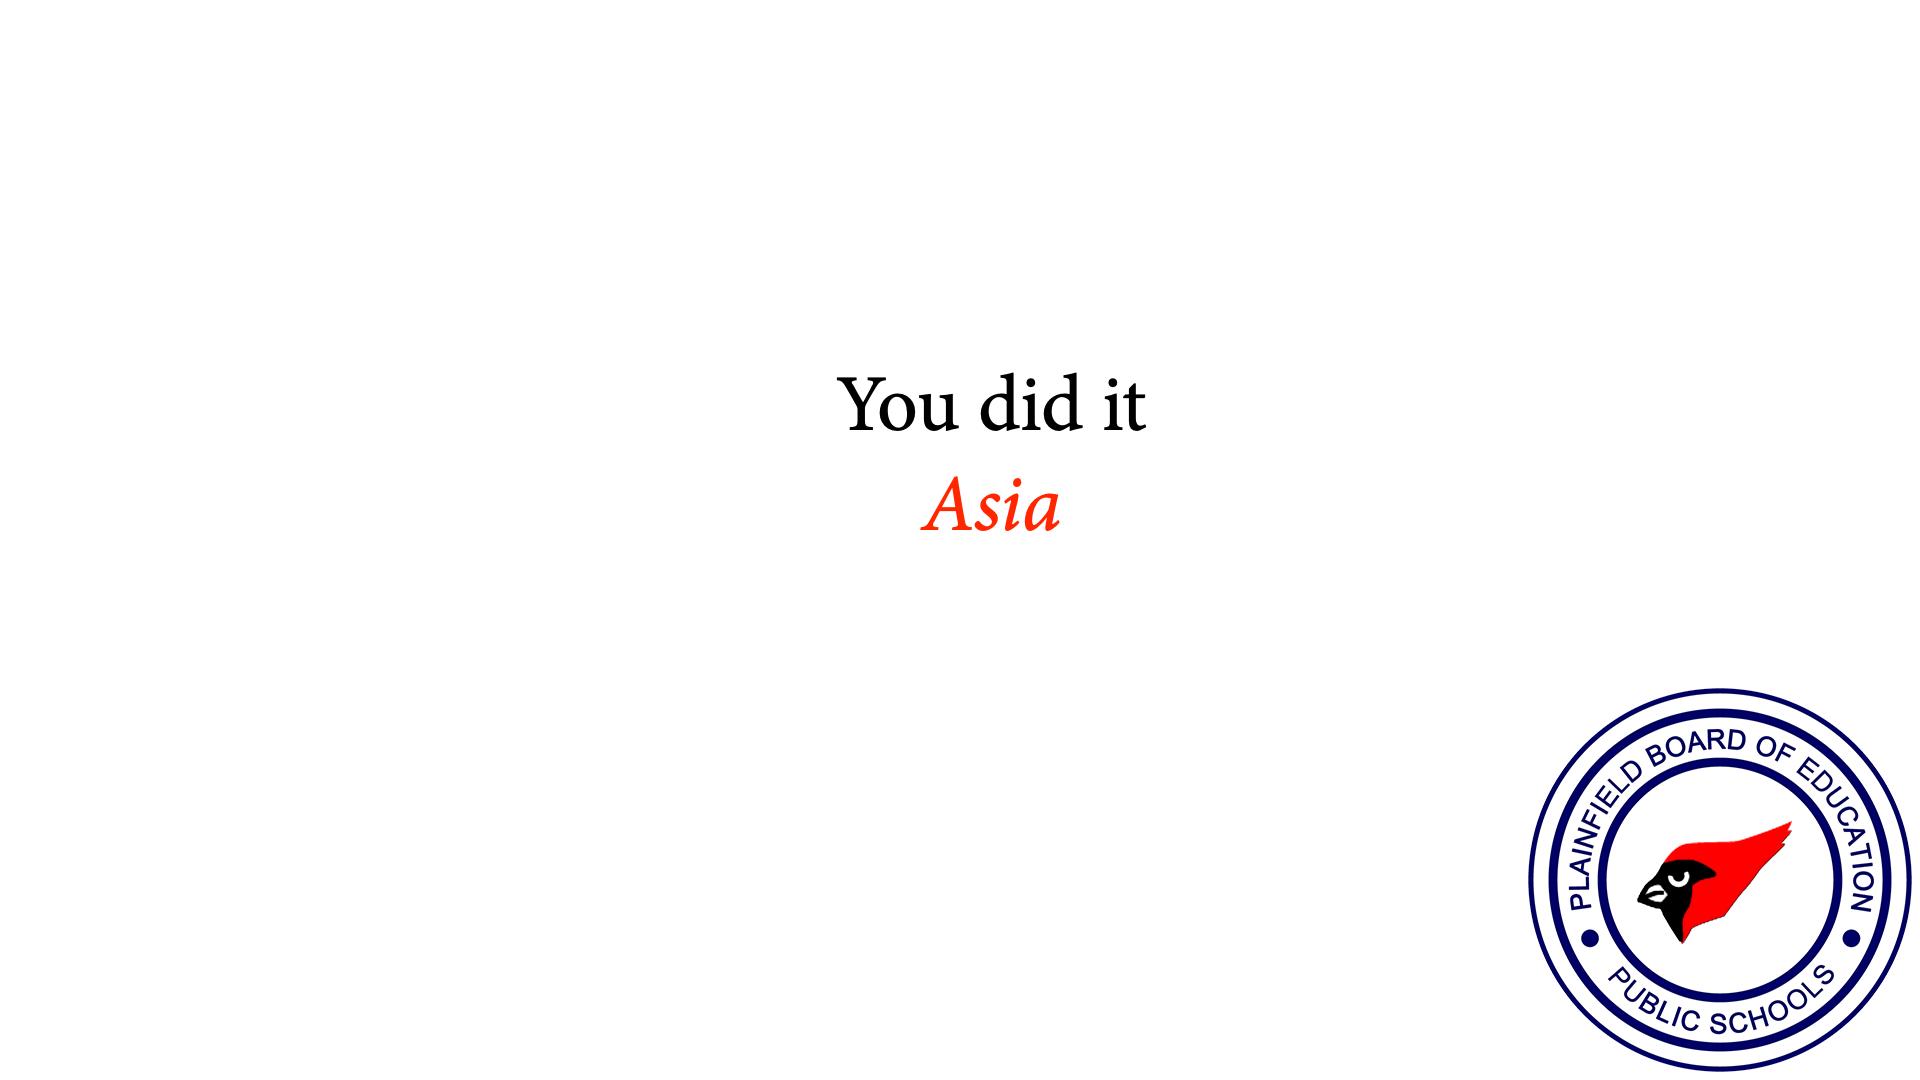 tbi_asia-brionni-michae-bradley_182.png